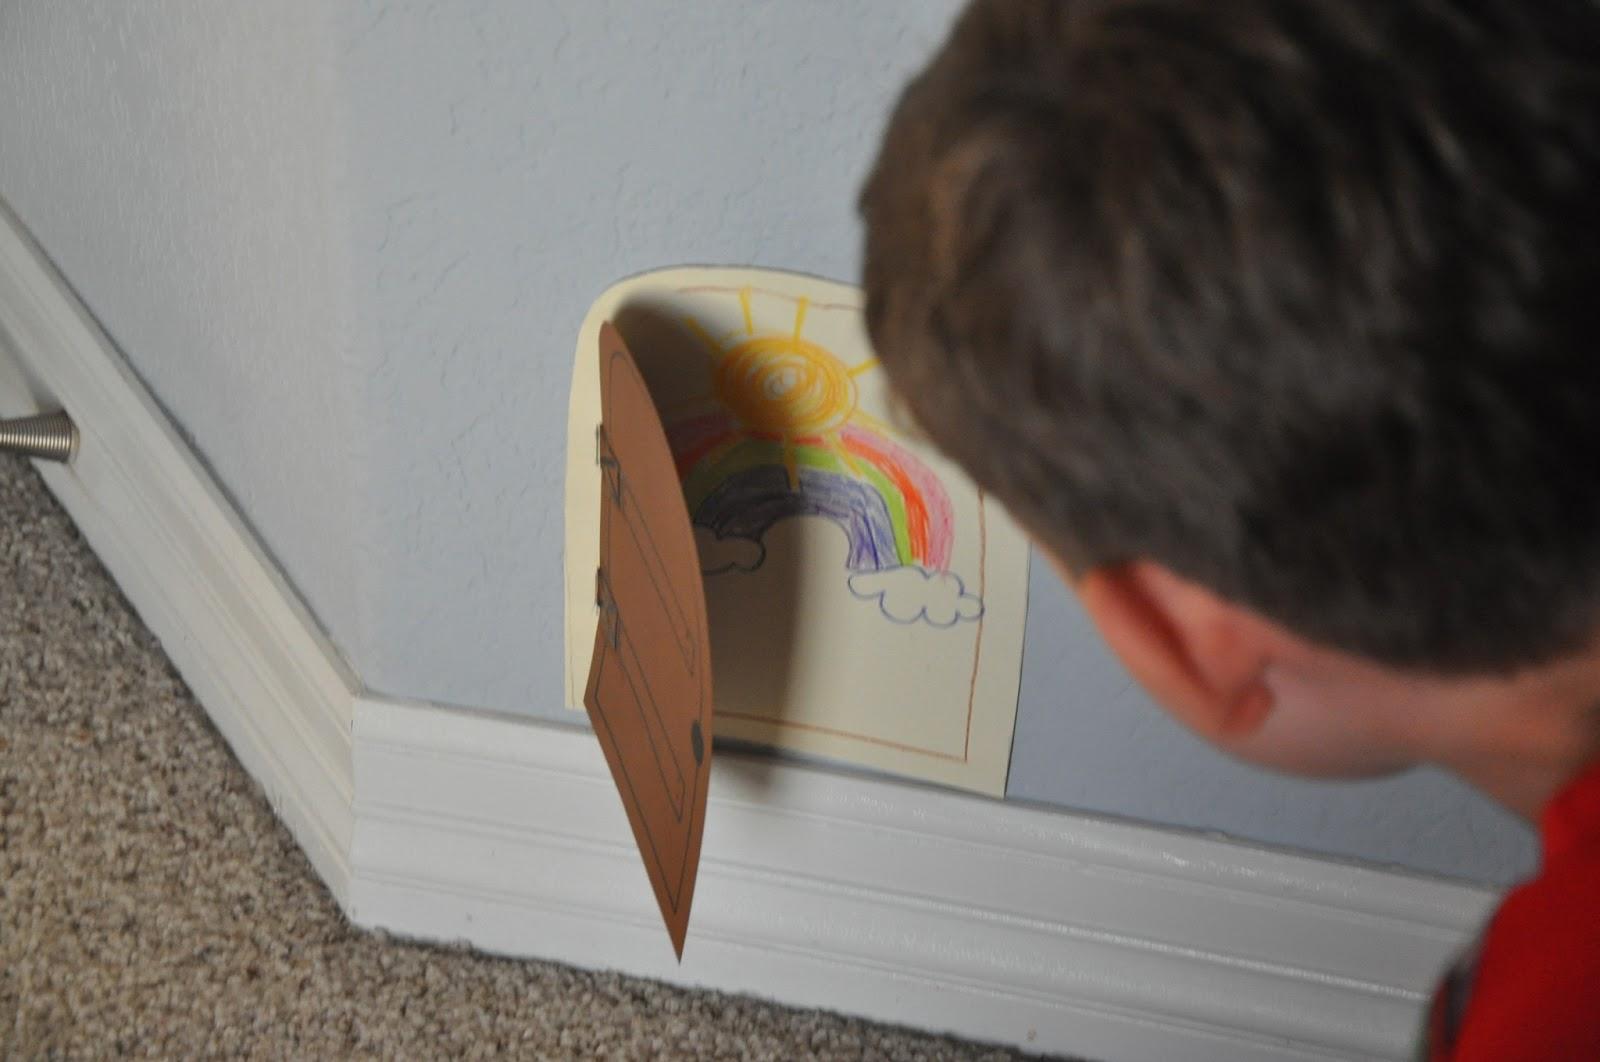 Mam s todoterreno puerta para el ratoncito p rez - Puerta ratoncito perez el corte ingles ...